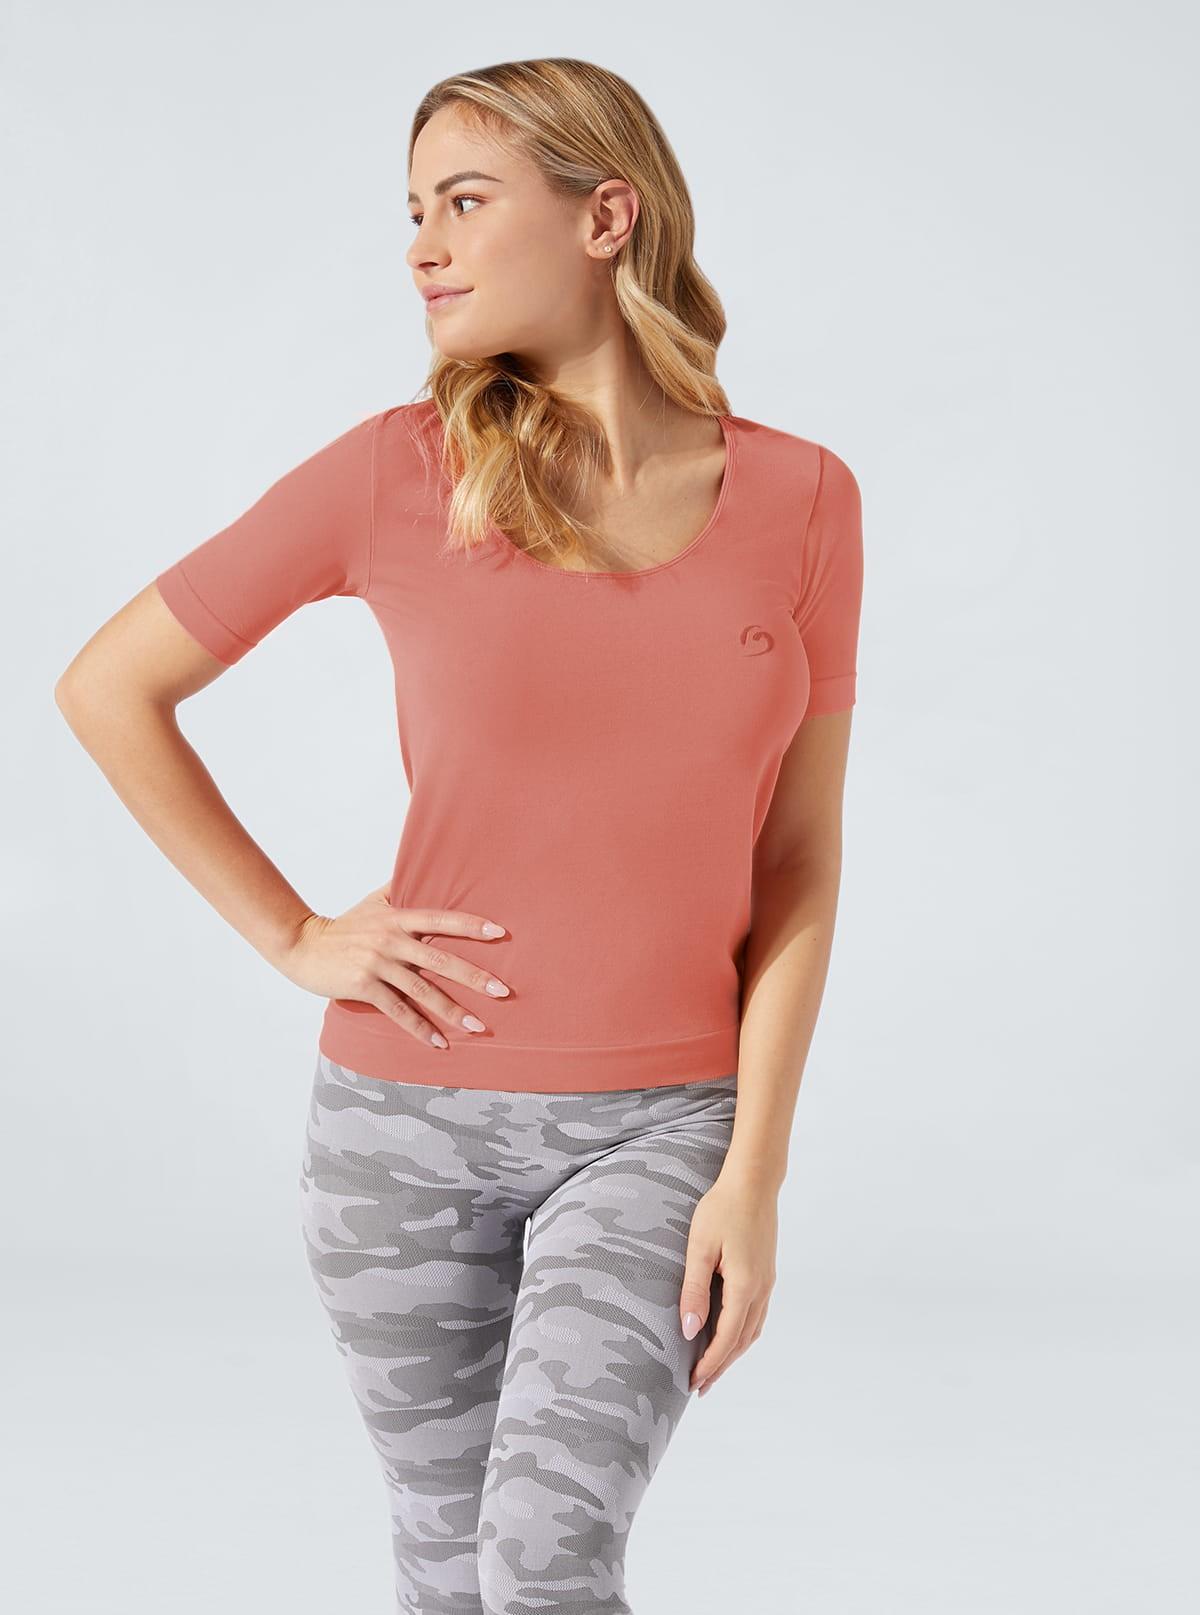 Camiseta cómoda colorida hidratante de manga corta